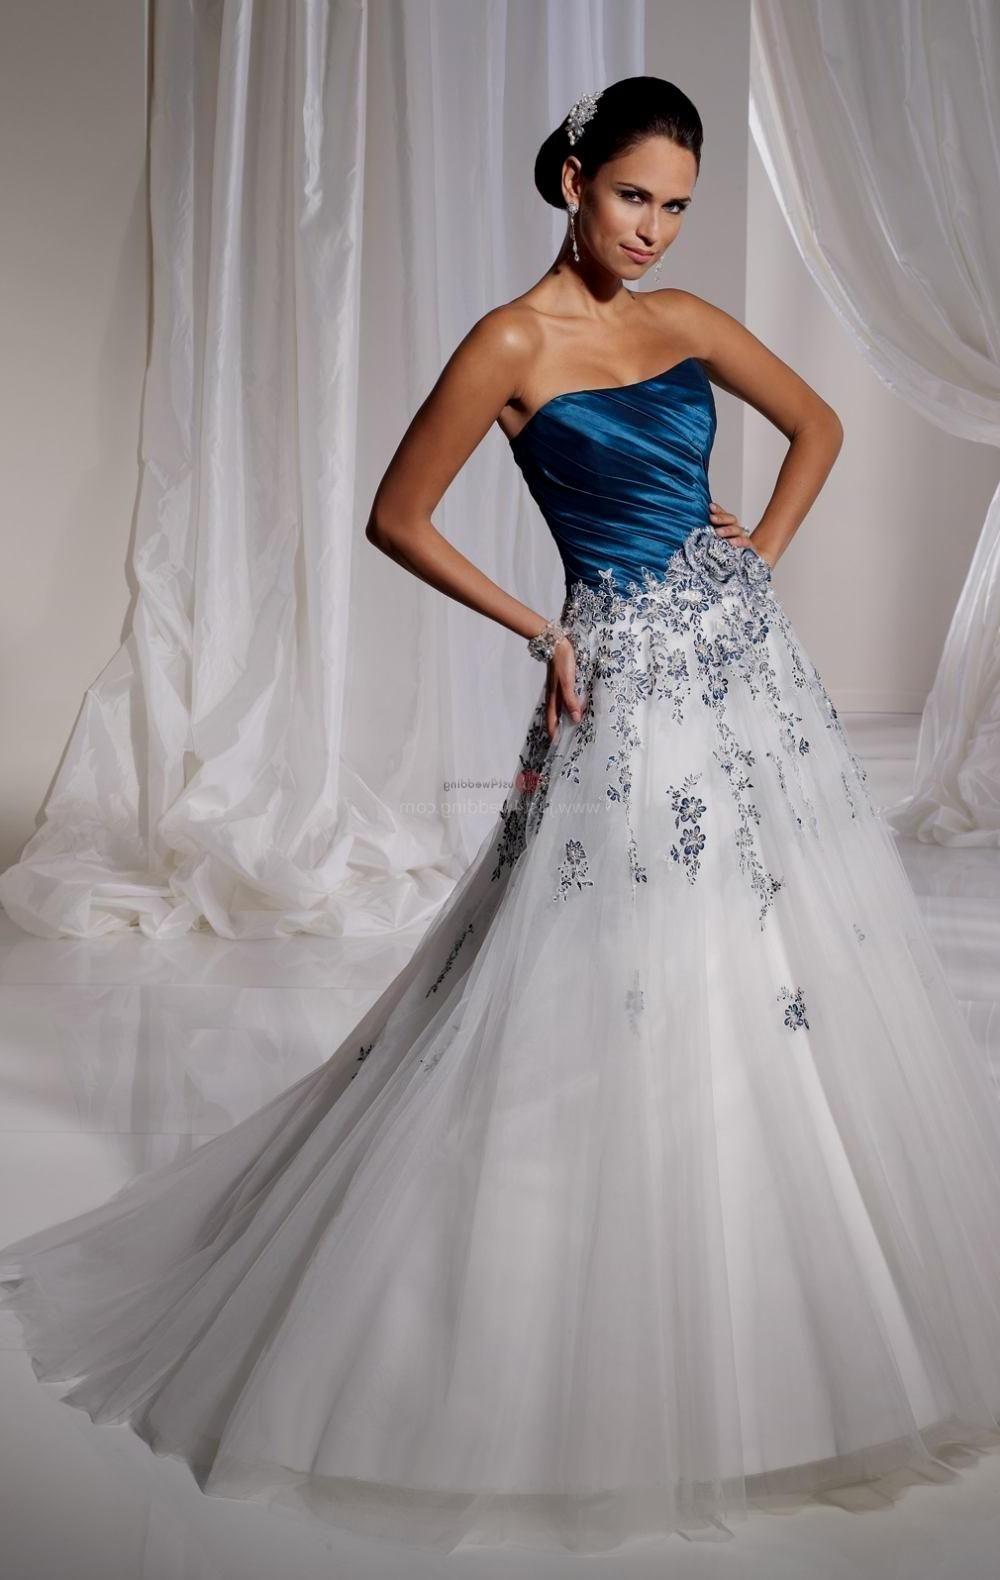 Image result for navy blue dresses for wedding bride diamonds in ...